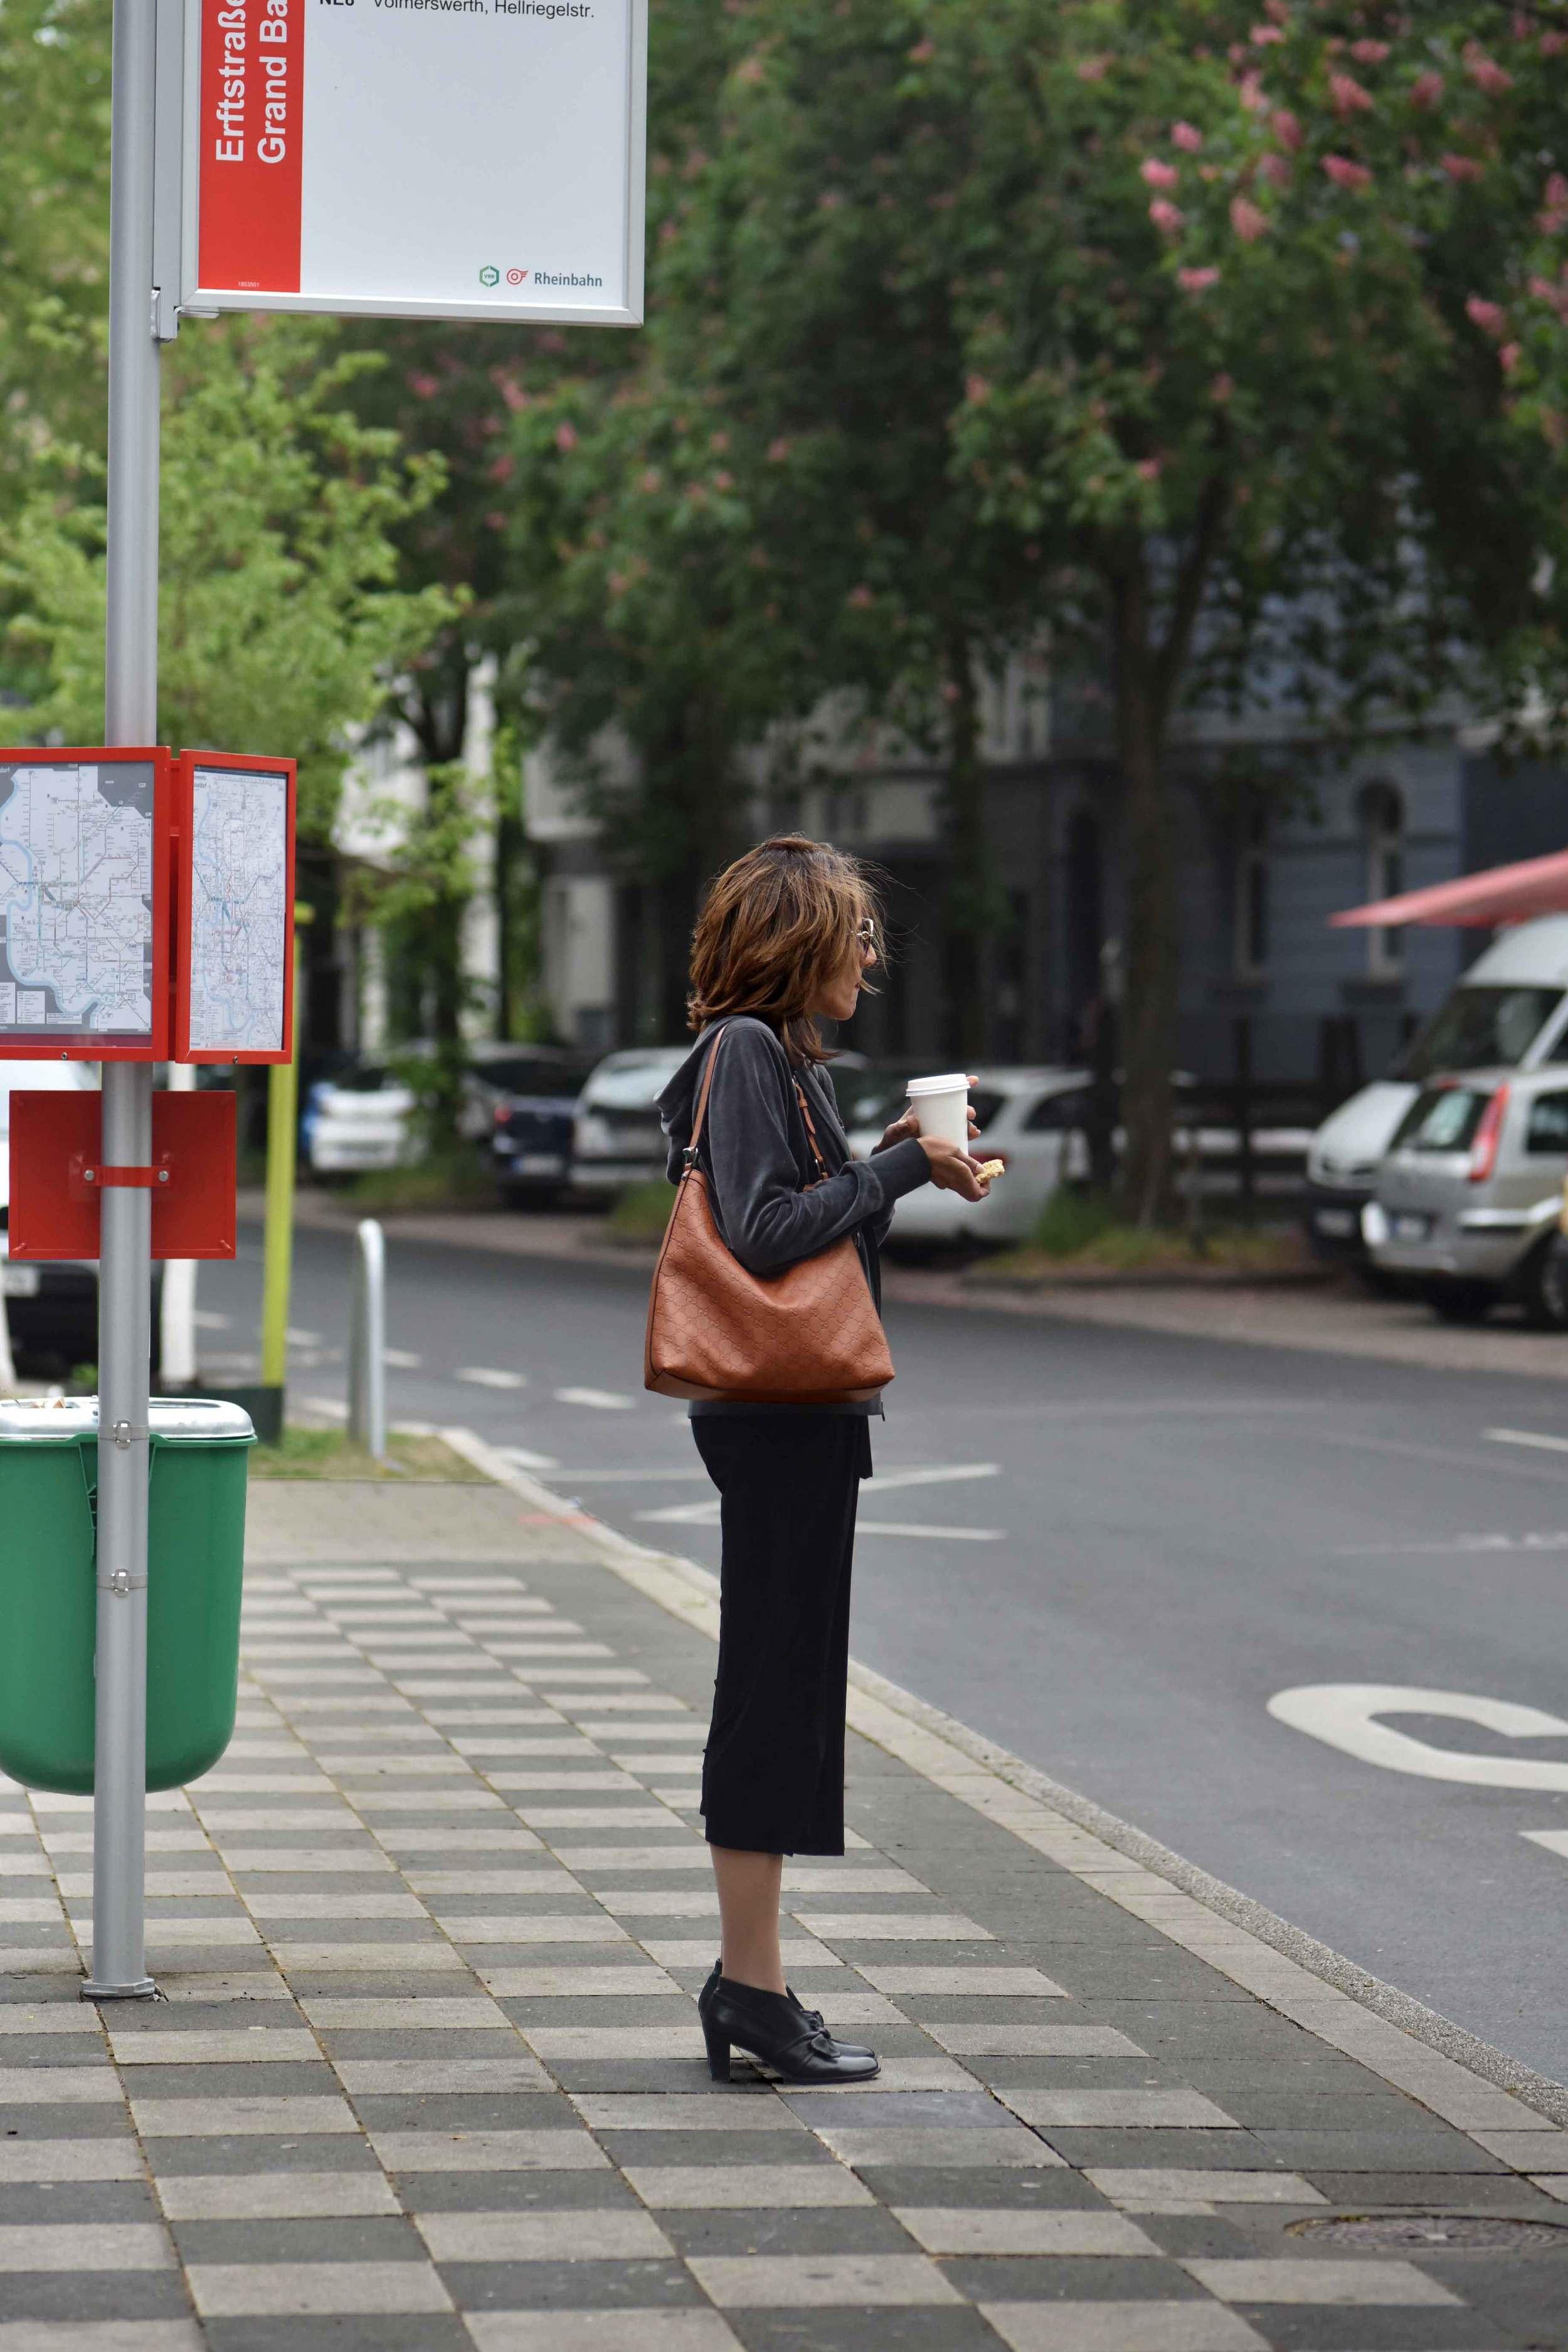 At the bus stop. Wearing Eileen Fisher black tank dress in viscose jersey, little black dress, Gucci handbag, Eddie Bauer velour jacket, Düsseldorf city, Germany. Image©sourcingstyle.com, Photo: Nicola Nolting.